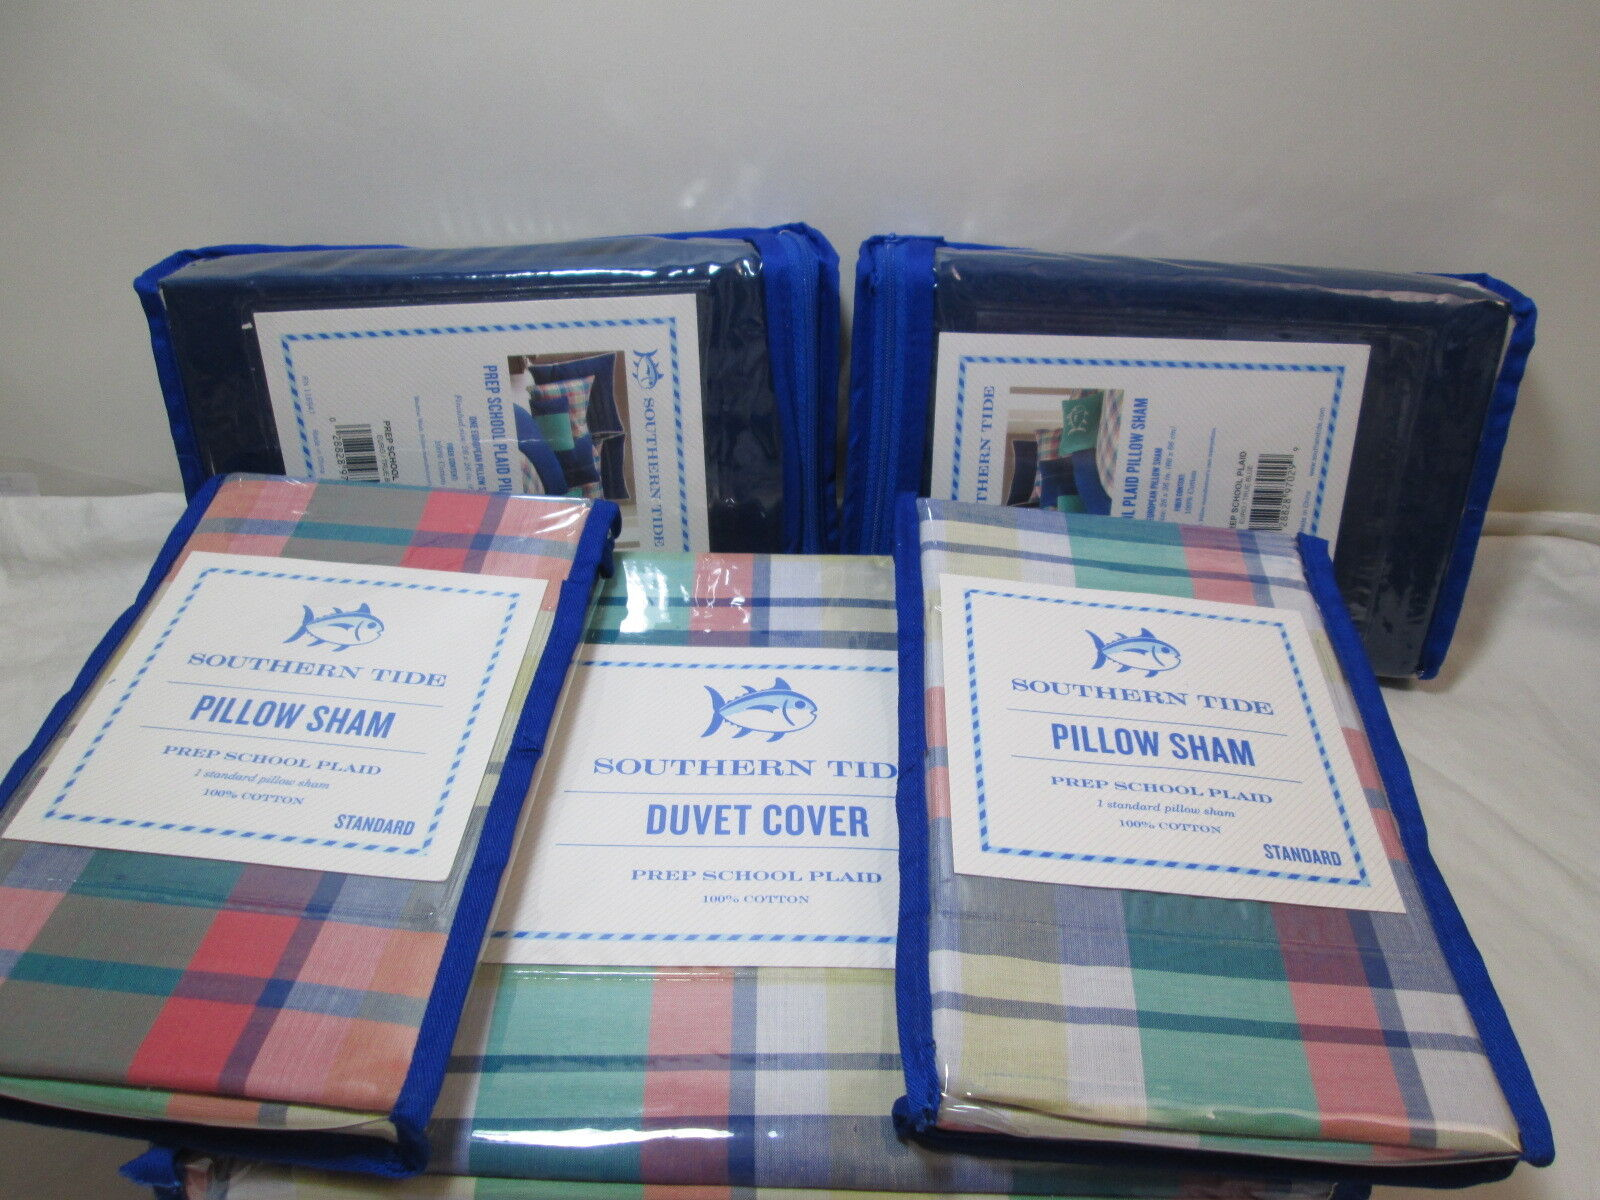 5 pcs Southern Tide Full Queen Duvet Cover and Shams Set Prep School Plaid NEW